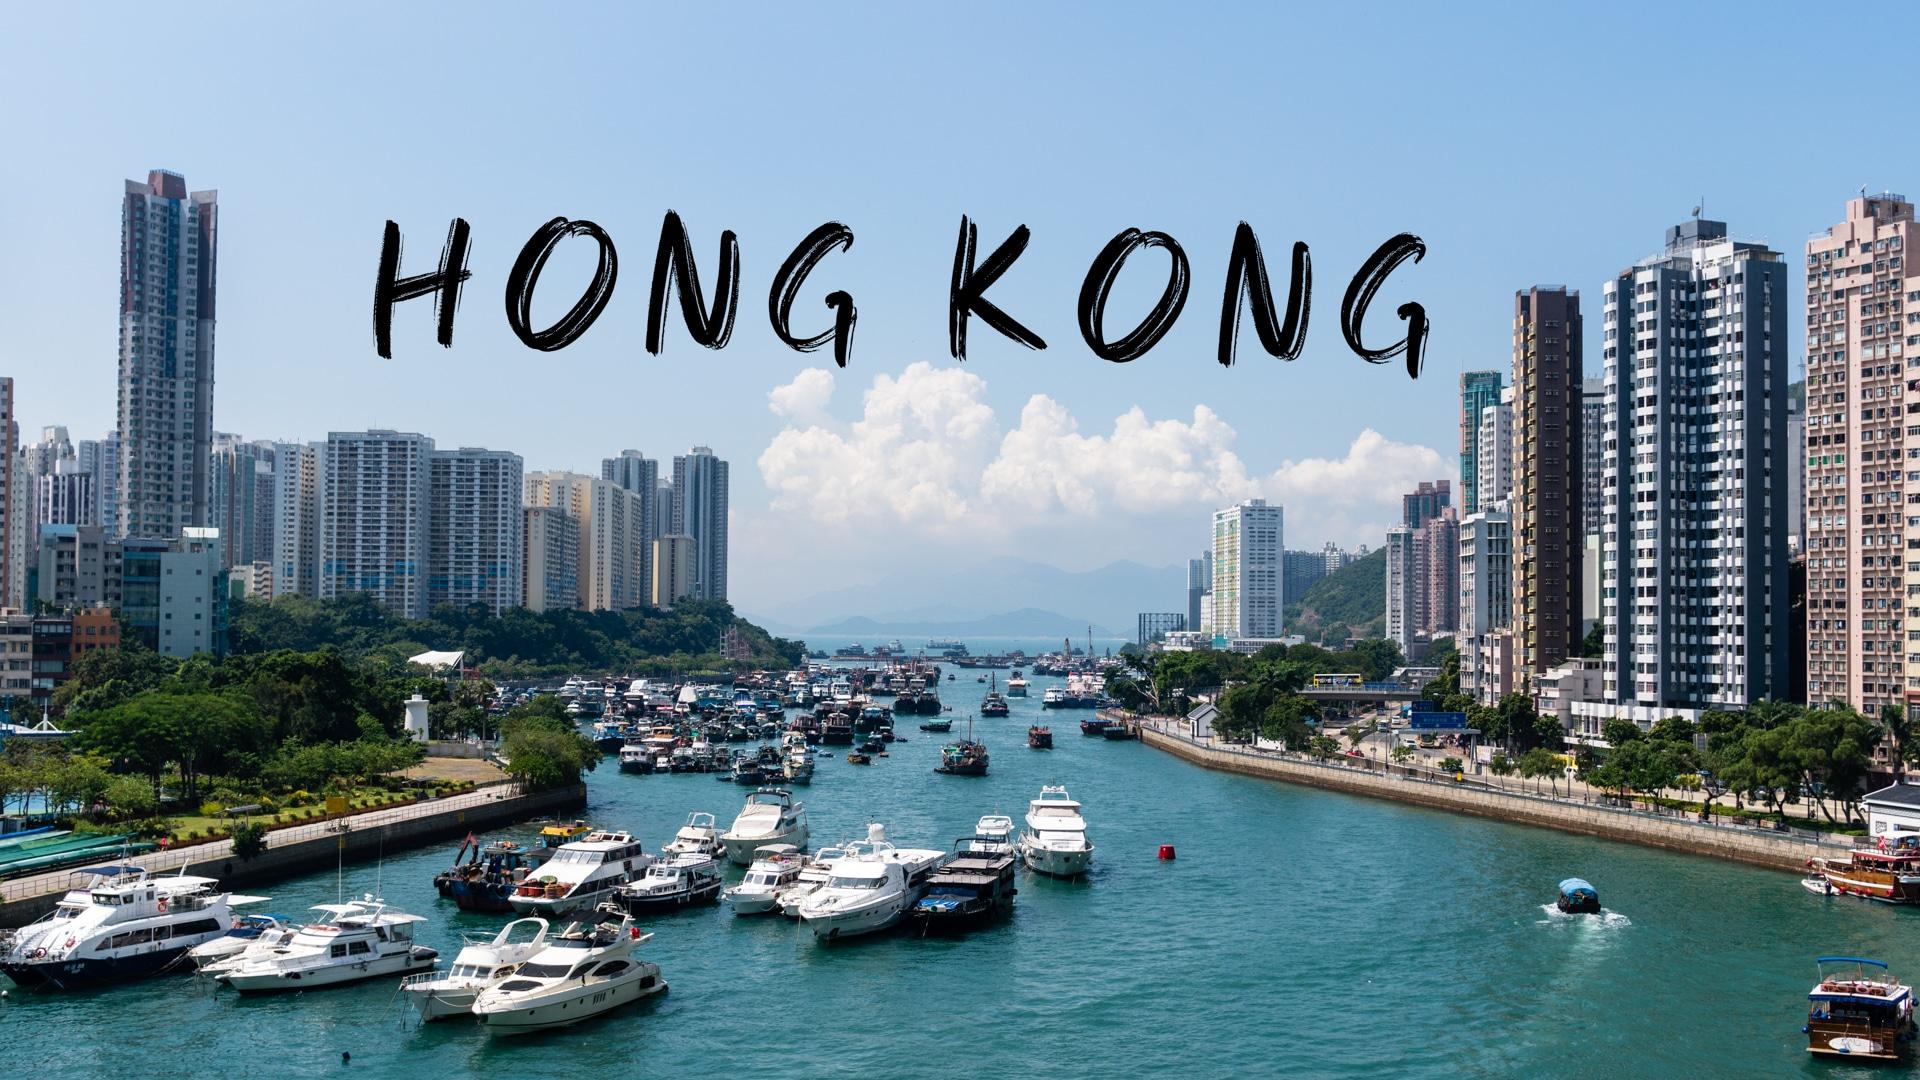 SerialHikers stop autostop world monde tour hitchhiking aventure adventure alternative travel voyage sans avion no fly hong kong destination